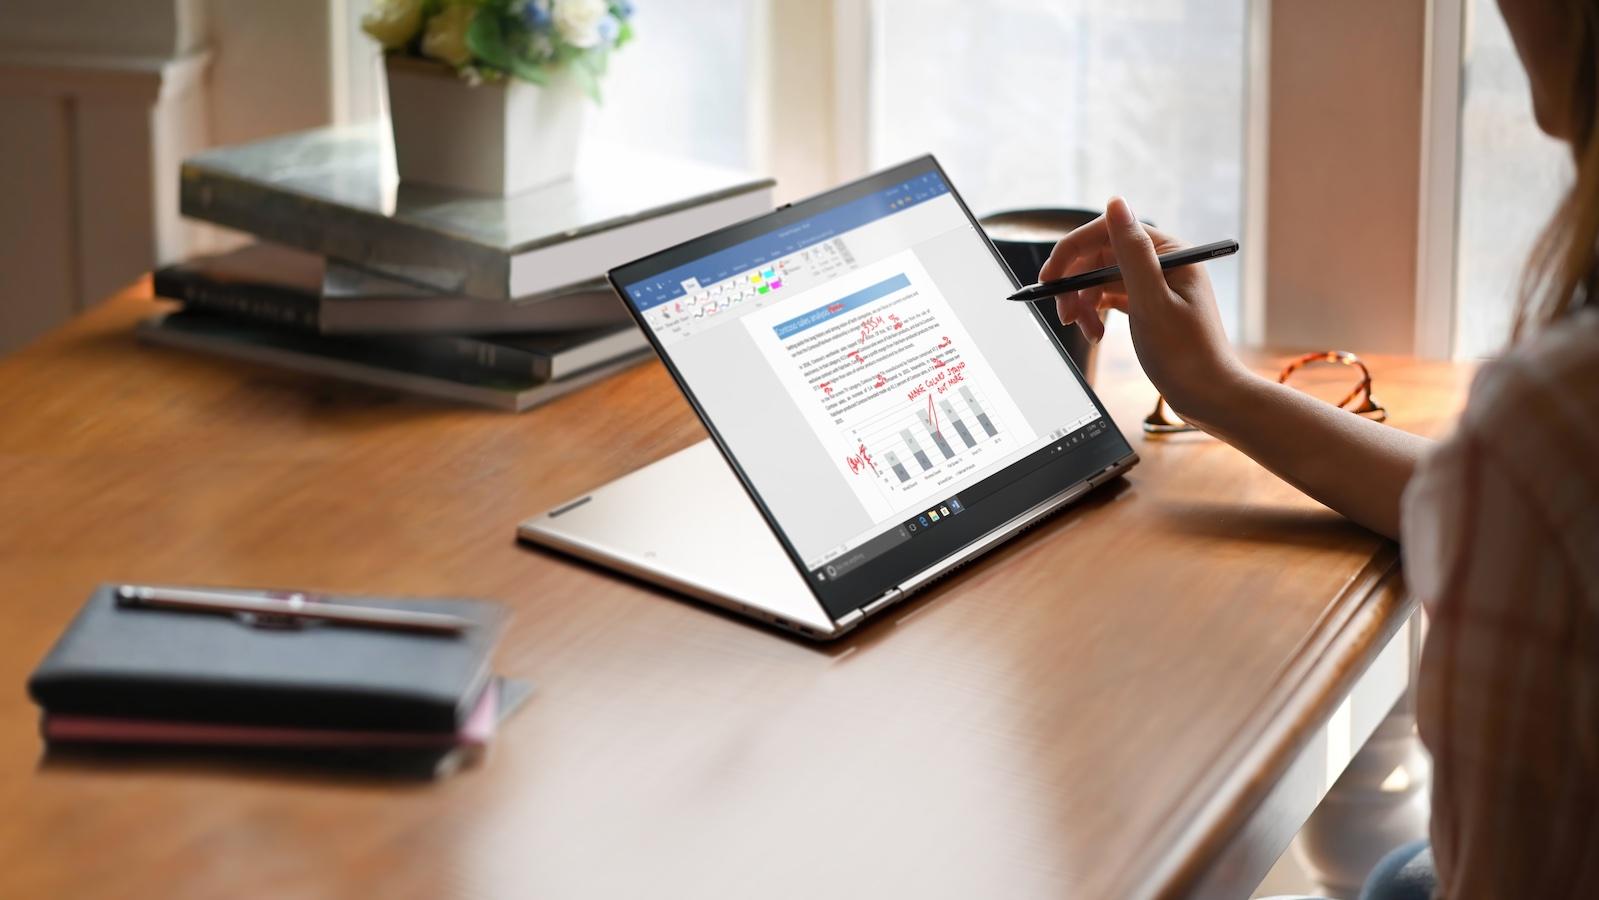 Lenovo ThinkPad X1 Titanium Yoga convertible laptop is the thinnest ThinkPad ever made